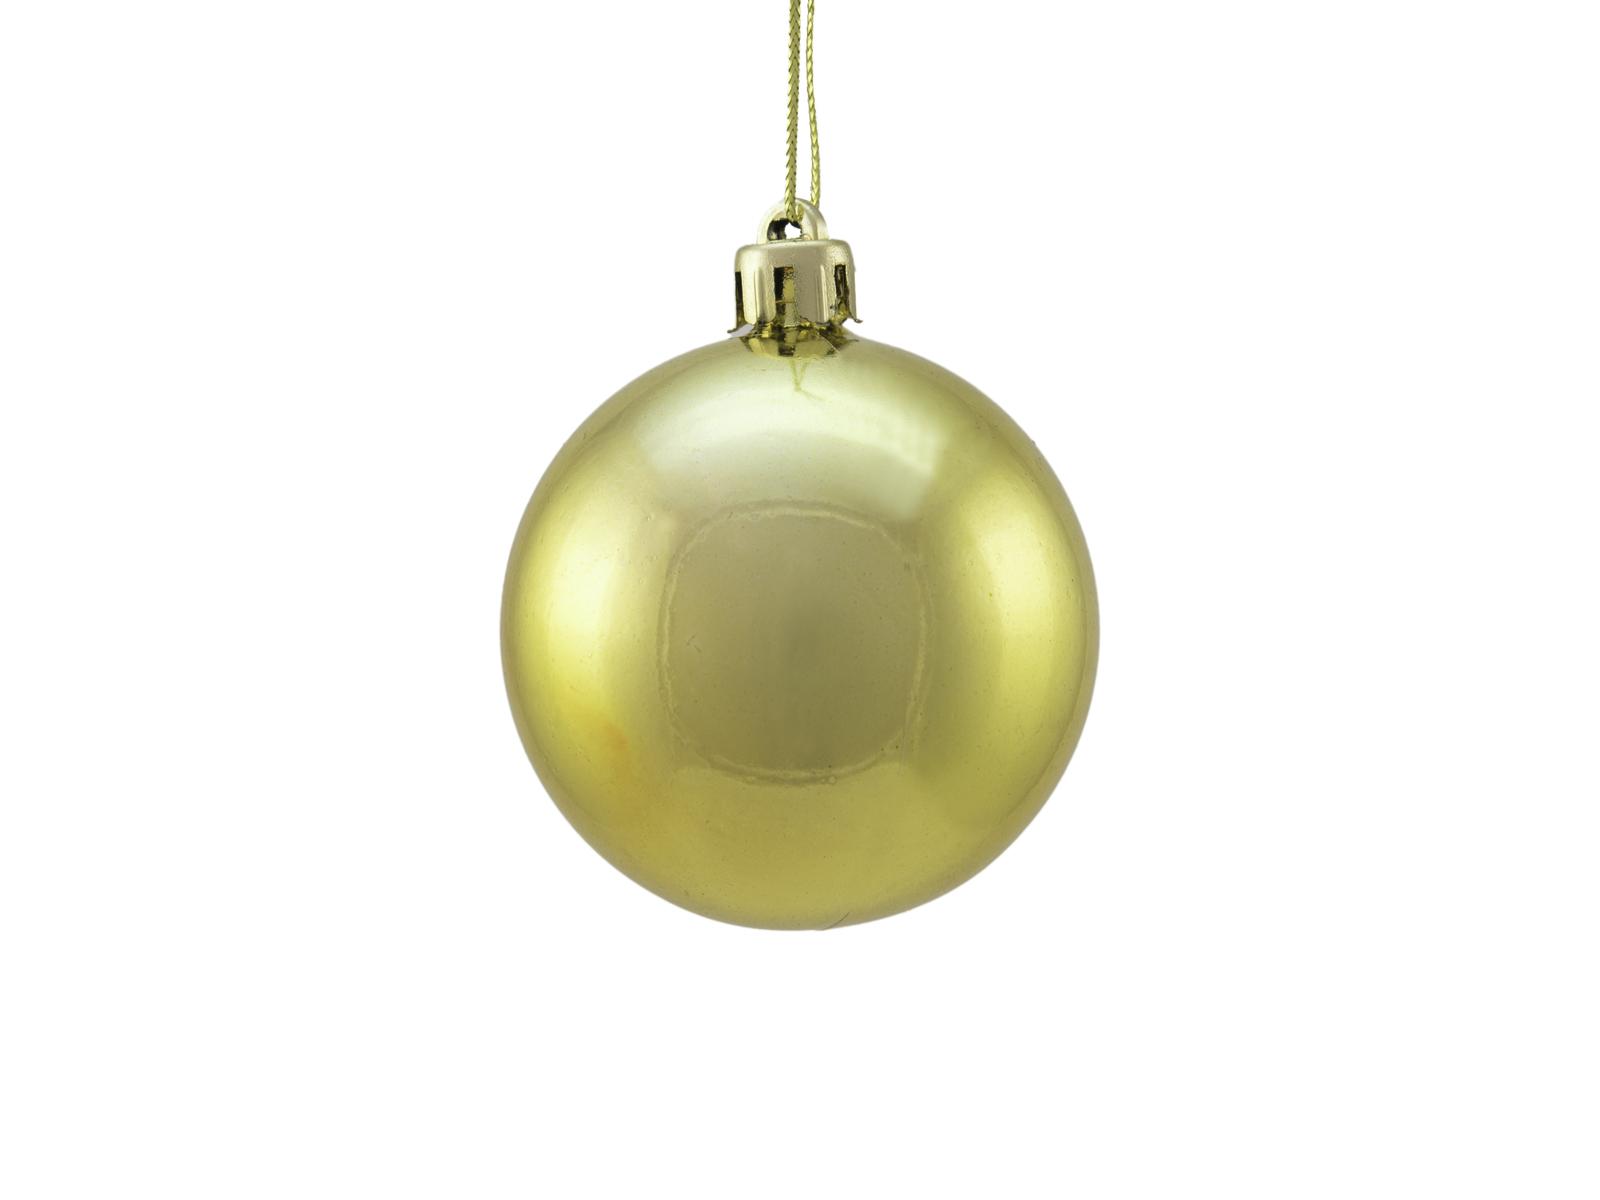 europalms-dekokugel-6cm-gold-metallic-6x